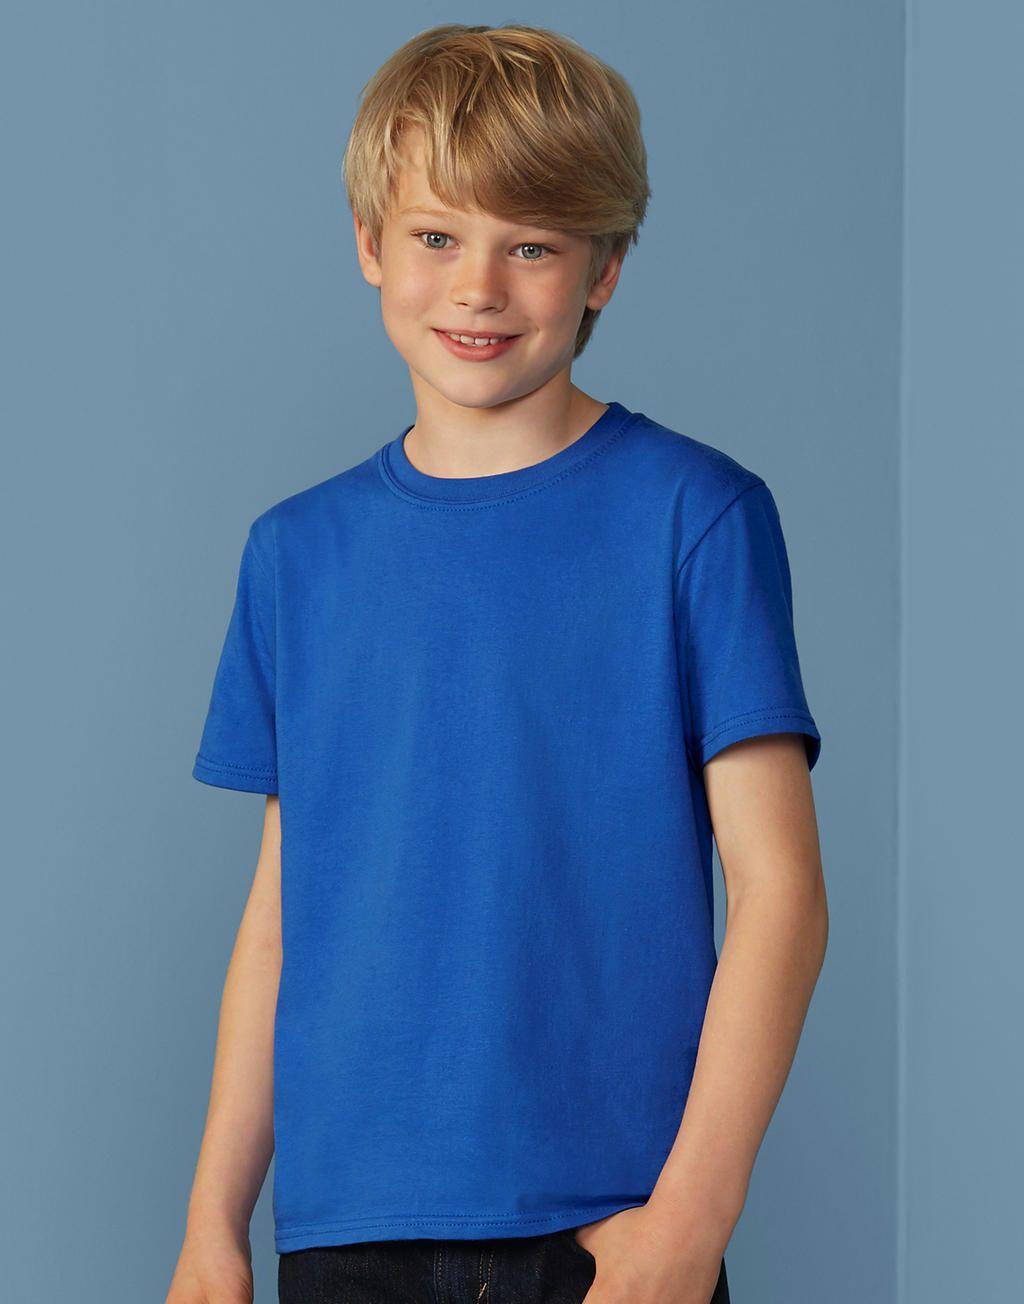 Kinder T Shirt Softstyle Gildan Hemd Shirts T Shirt